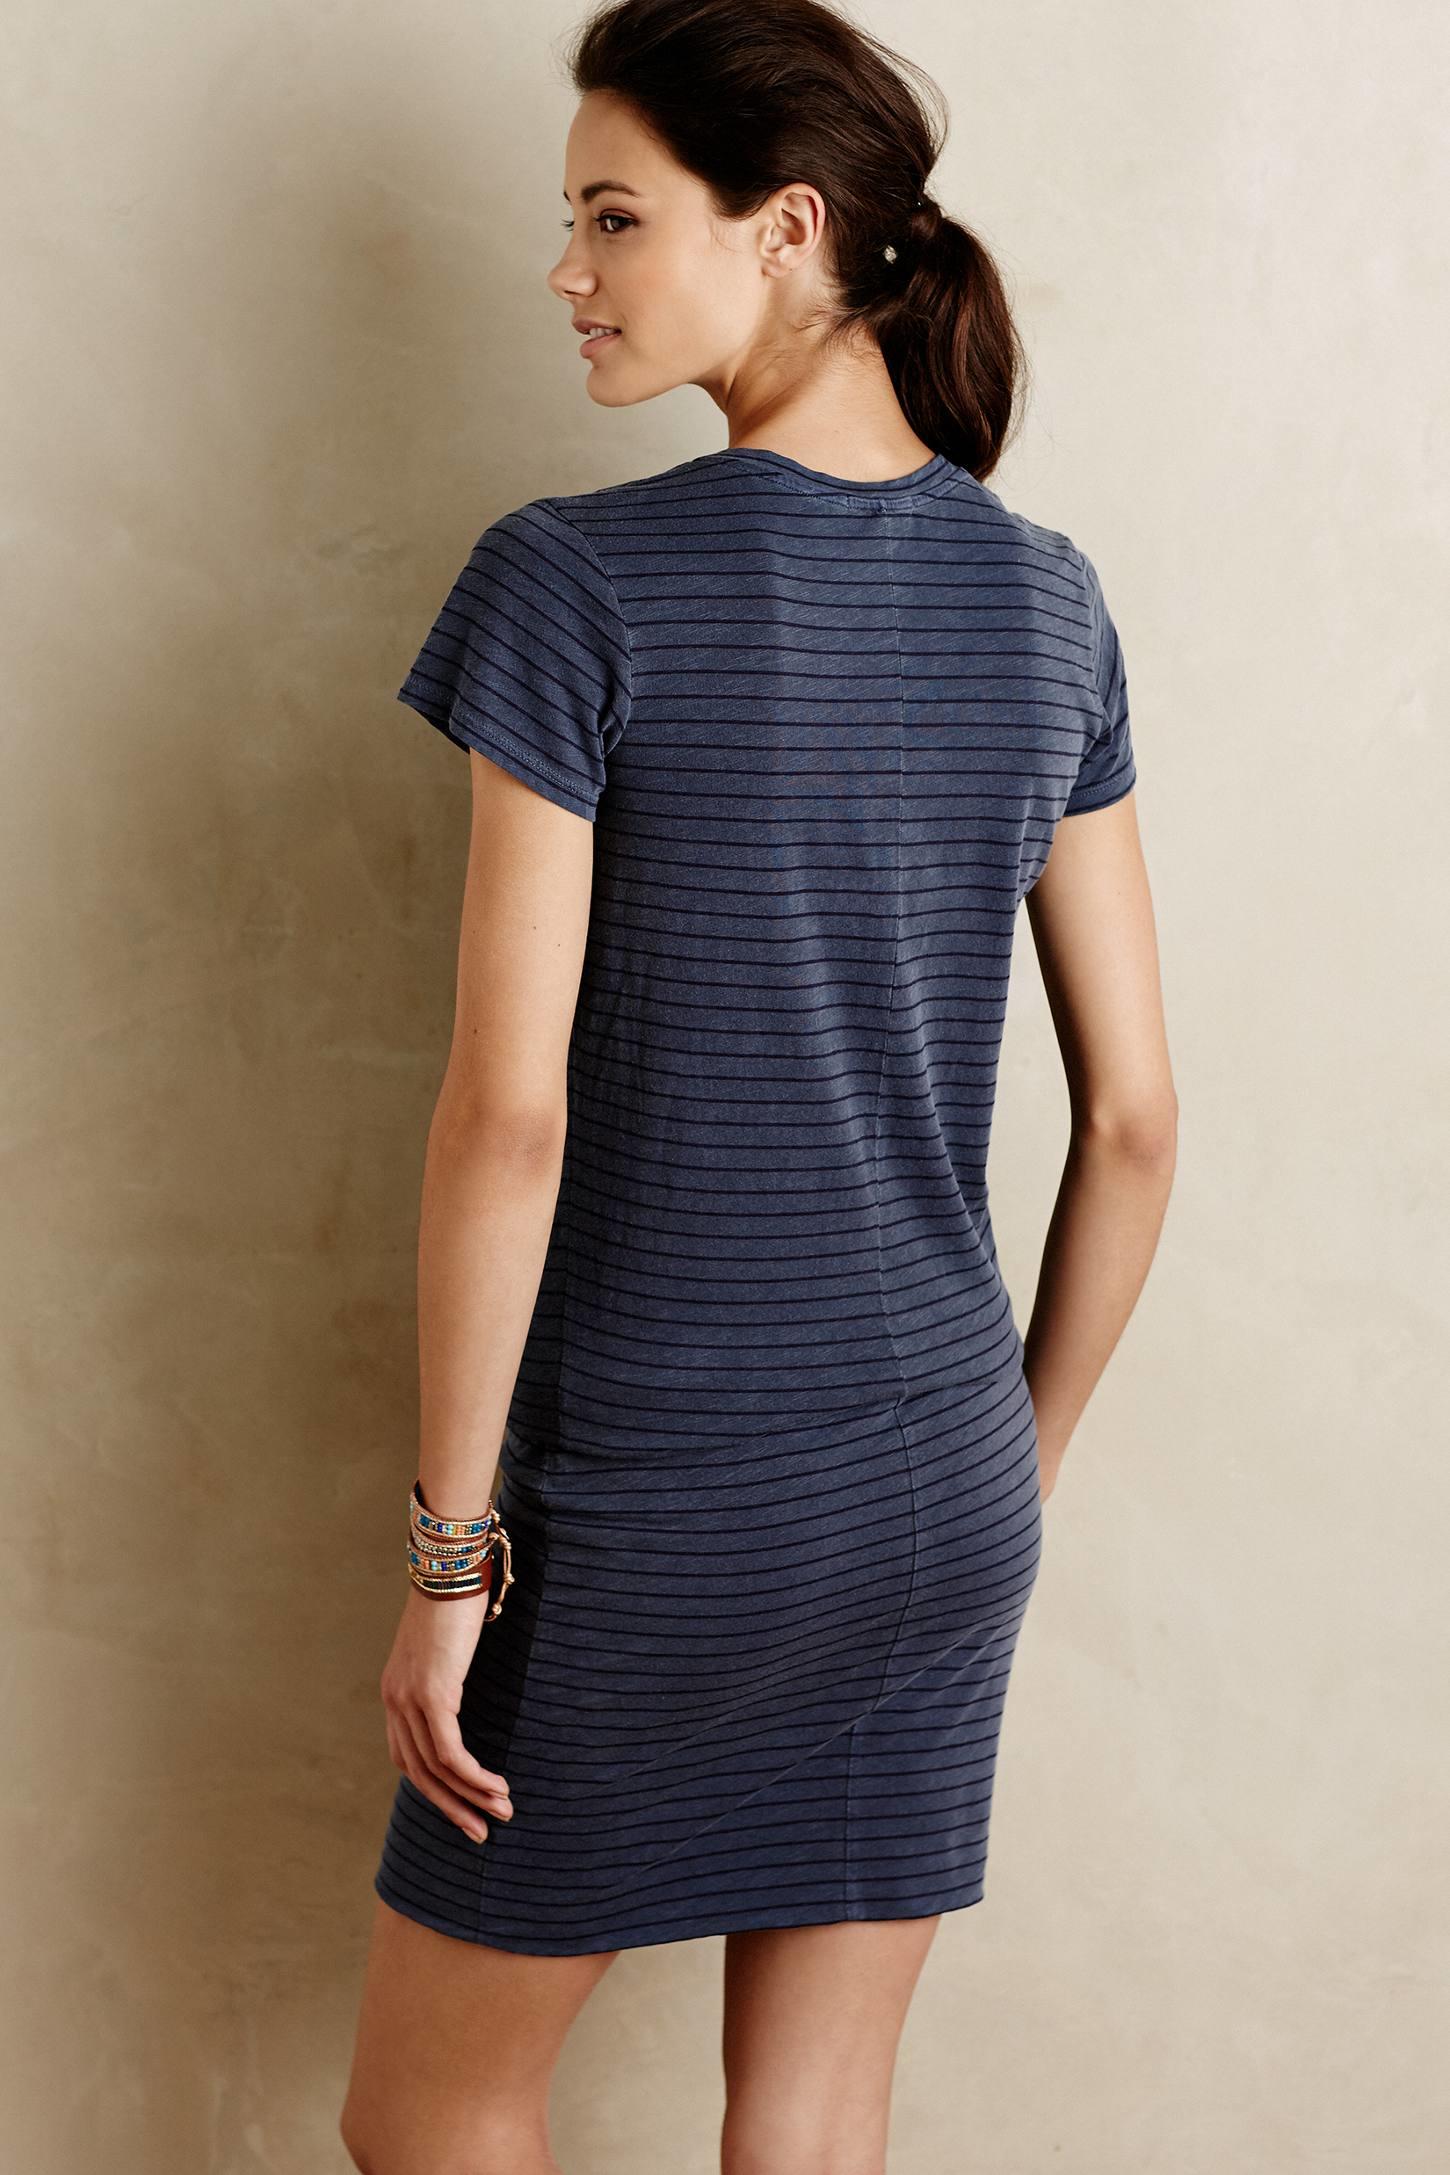 Sundry raglan dress images